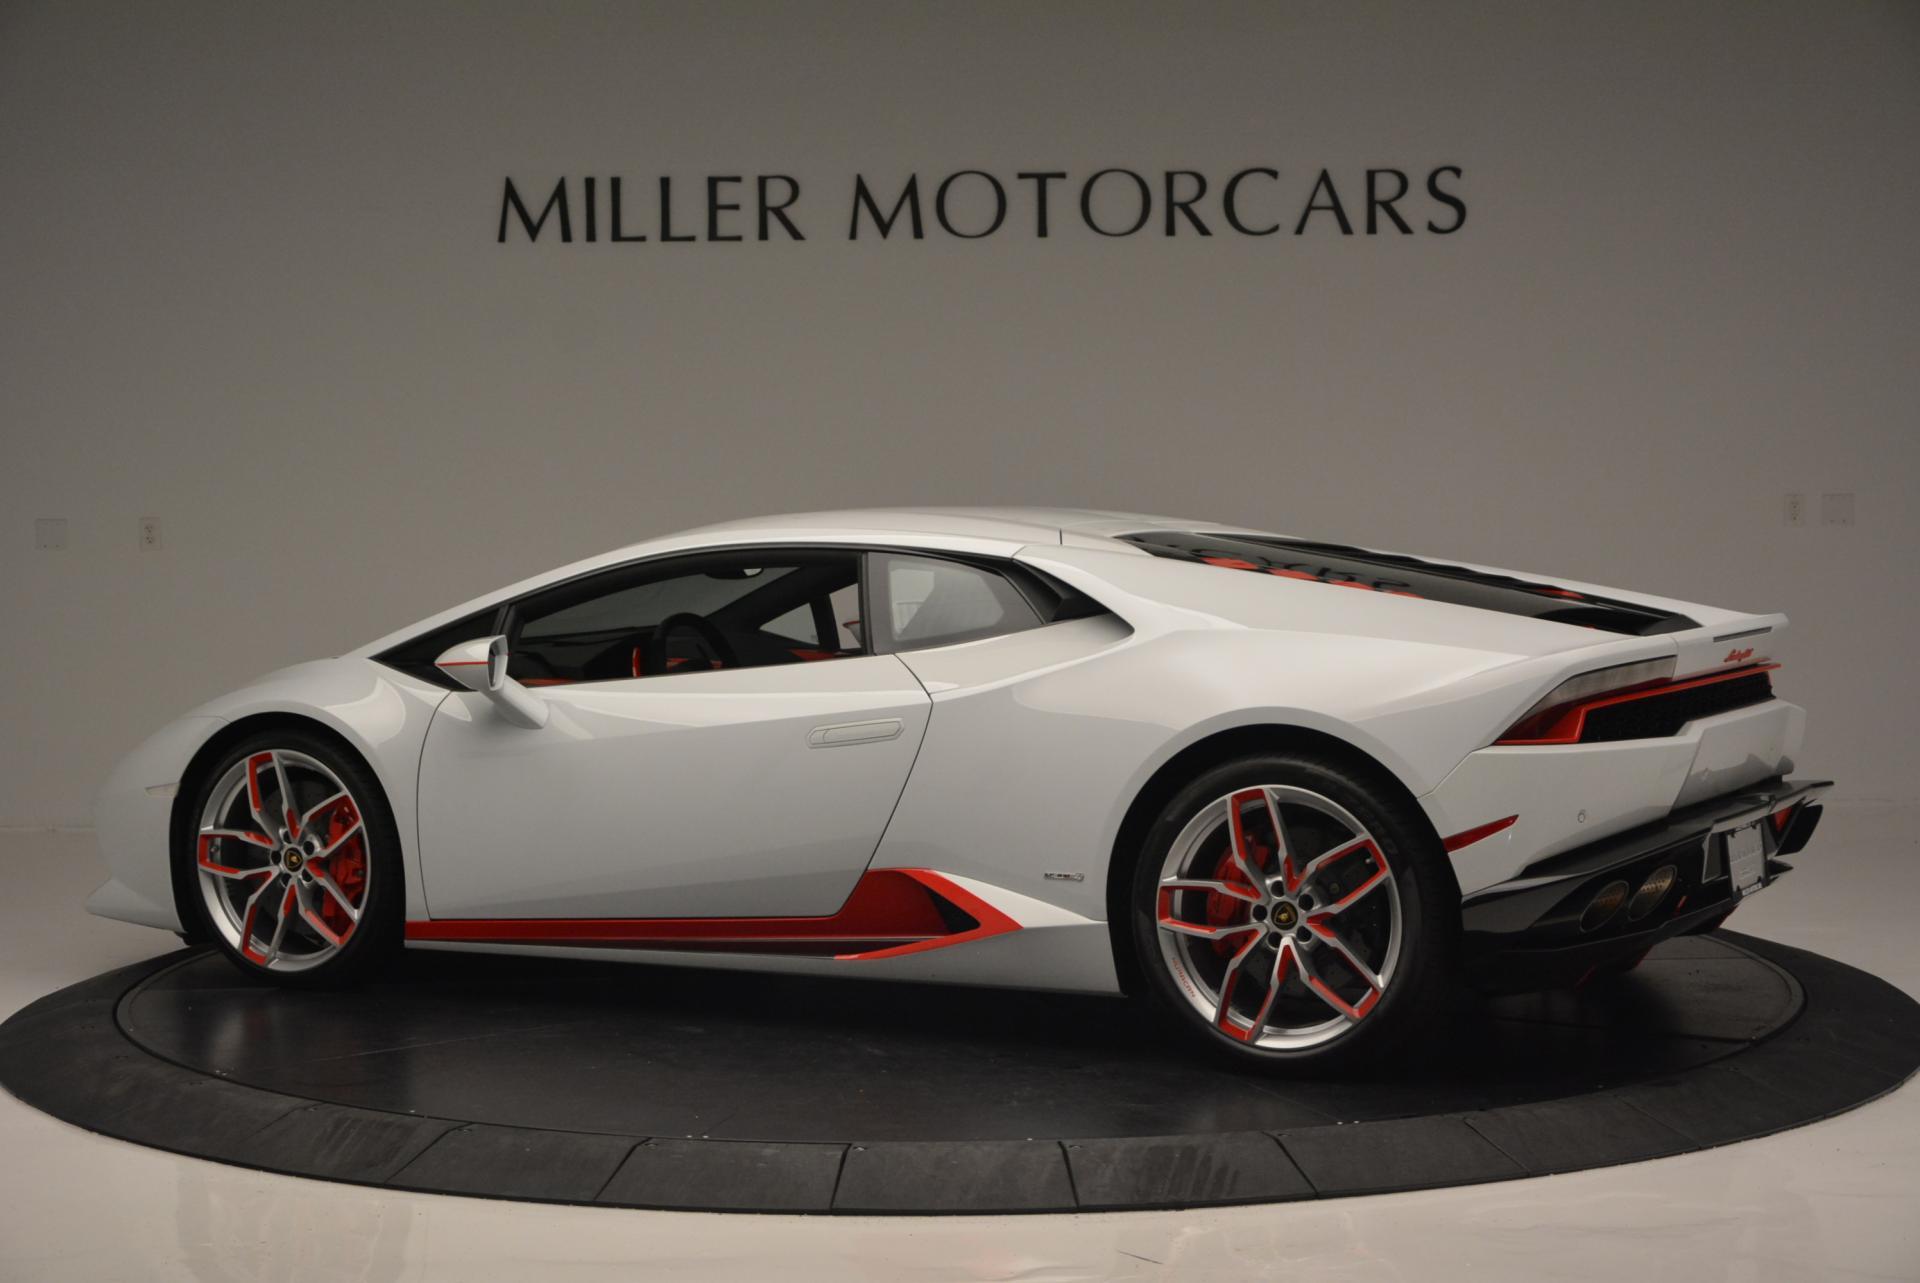 Used 2015 Lamborghini Huracan LP610-4 For Sale In Greenwich, CT. Alfa Romeo of Greenwich, F1707A 114_p4